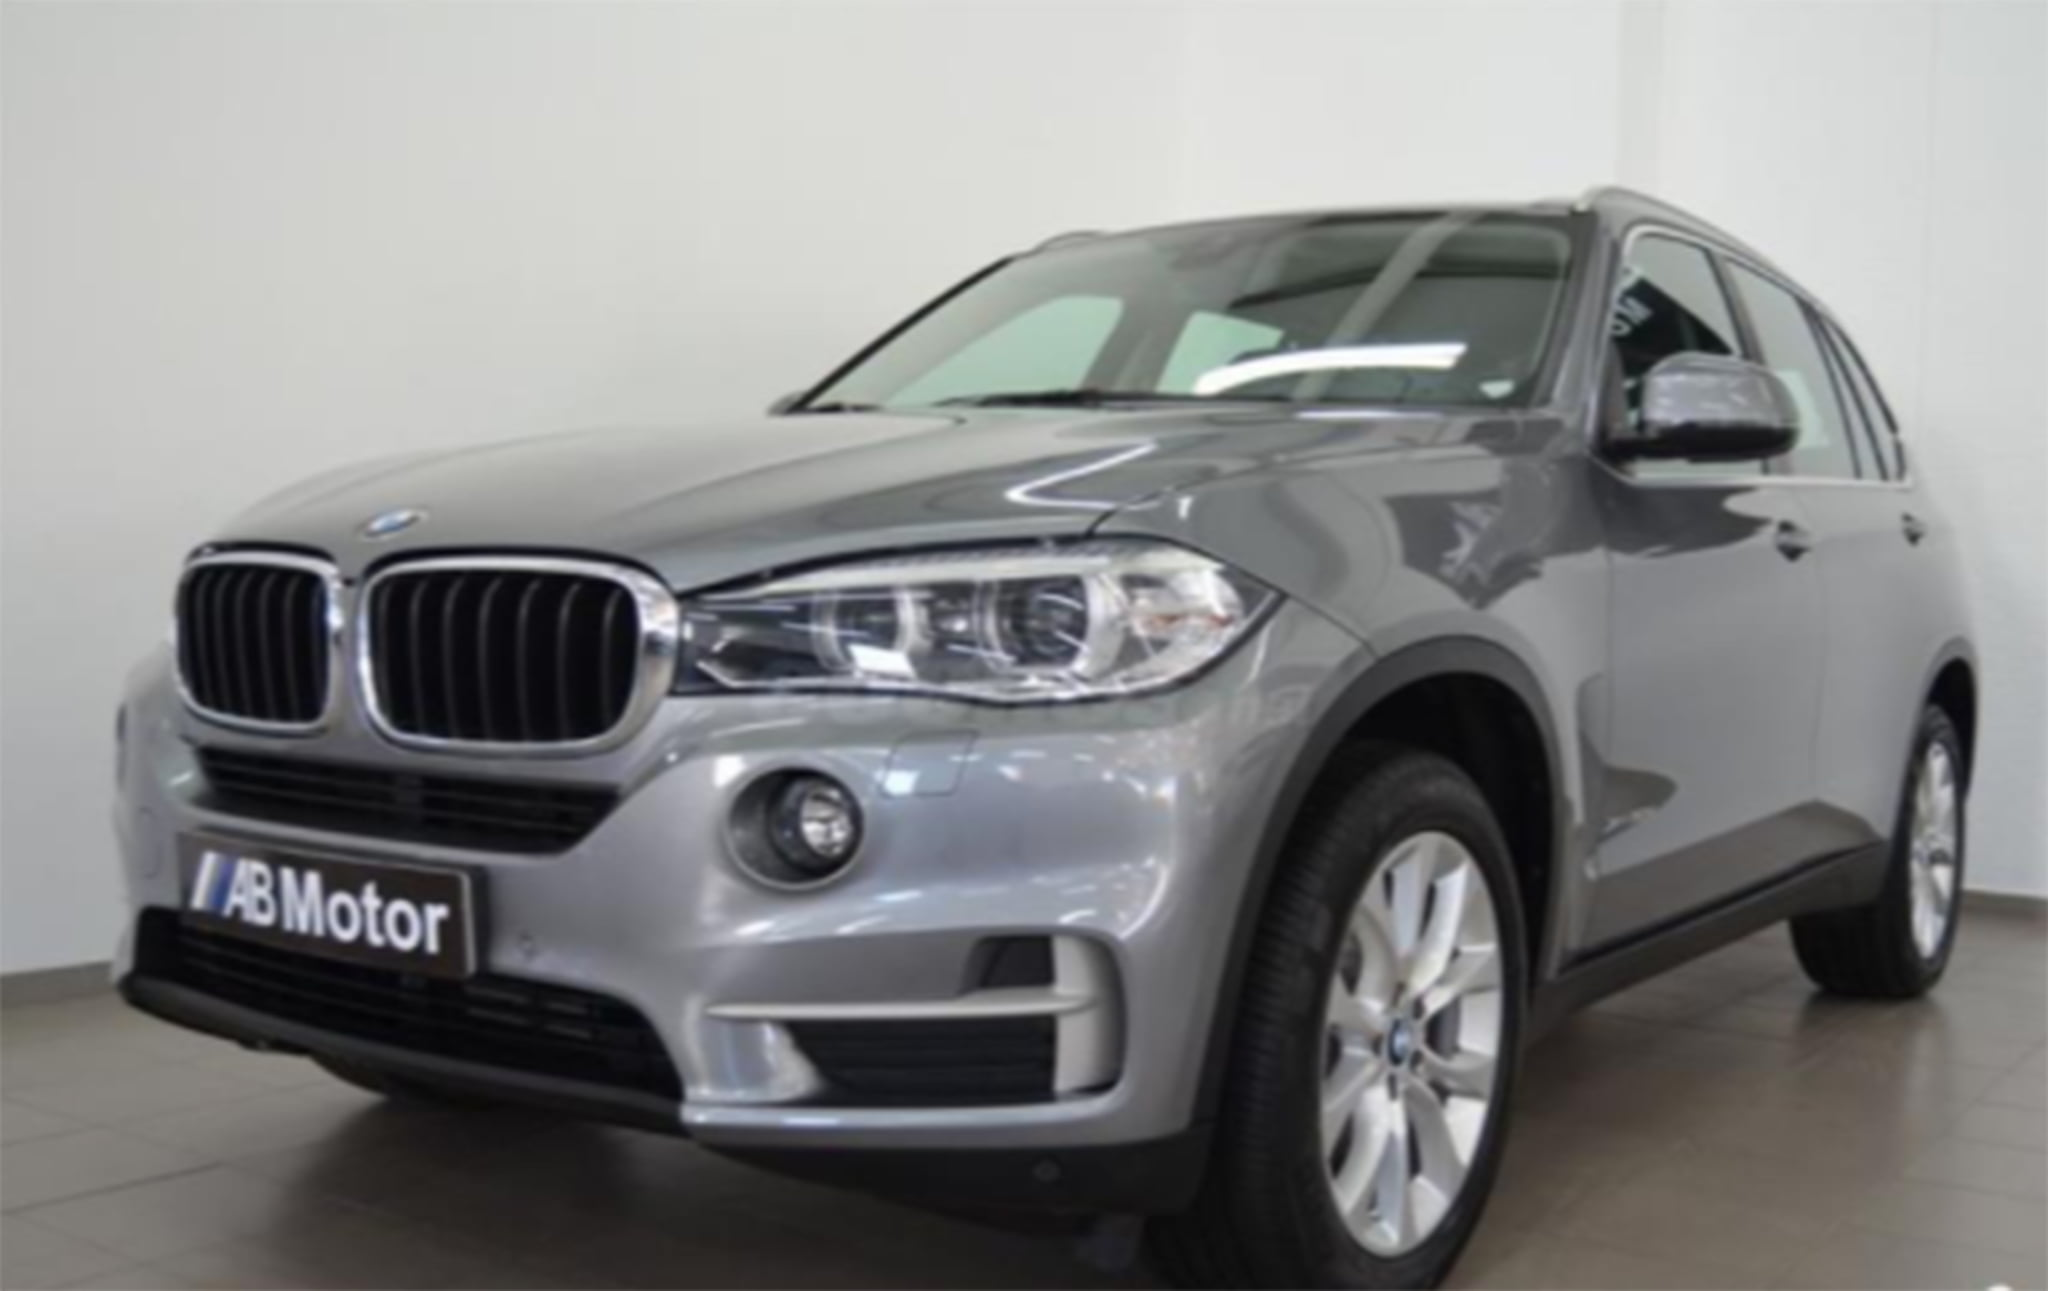 BMW X5 xDRIVE30d 5p. - ab-motor